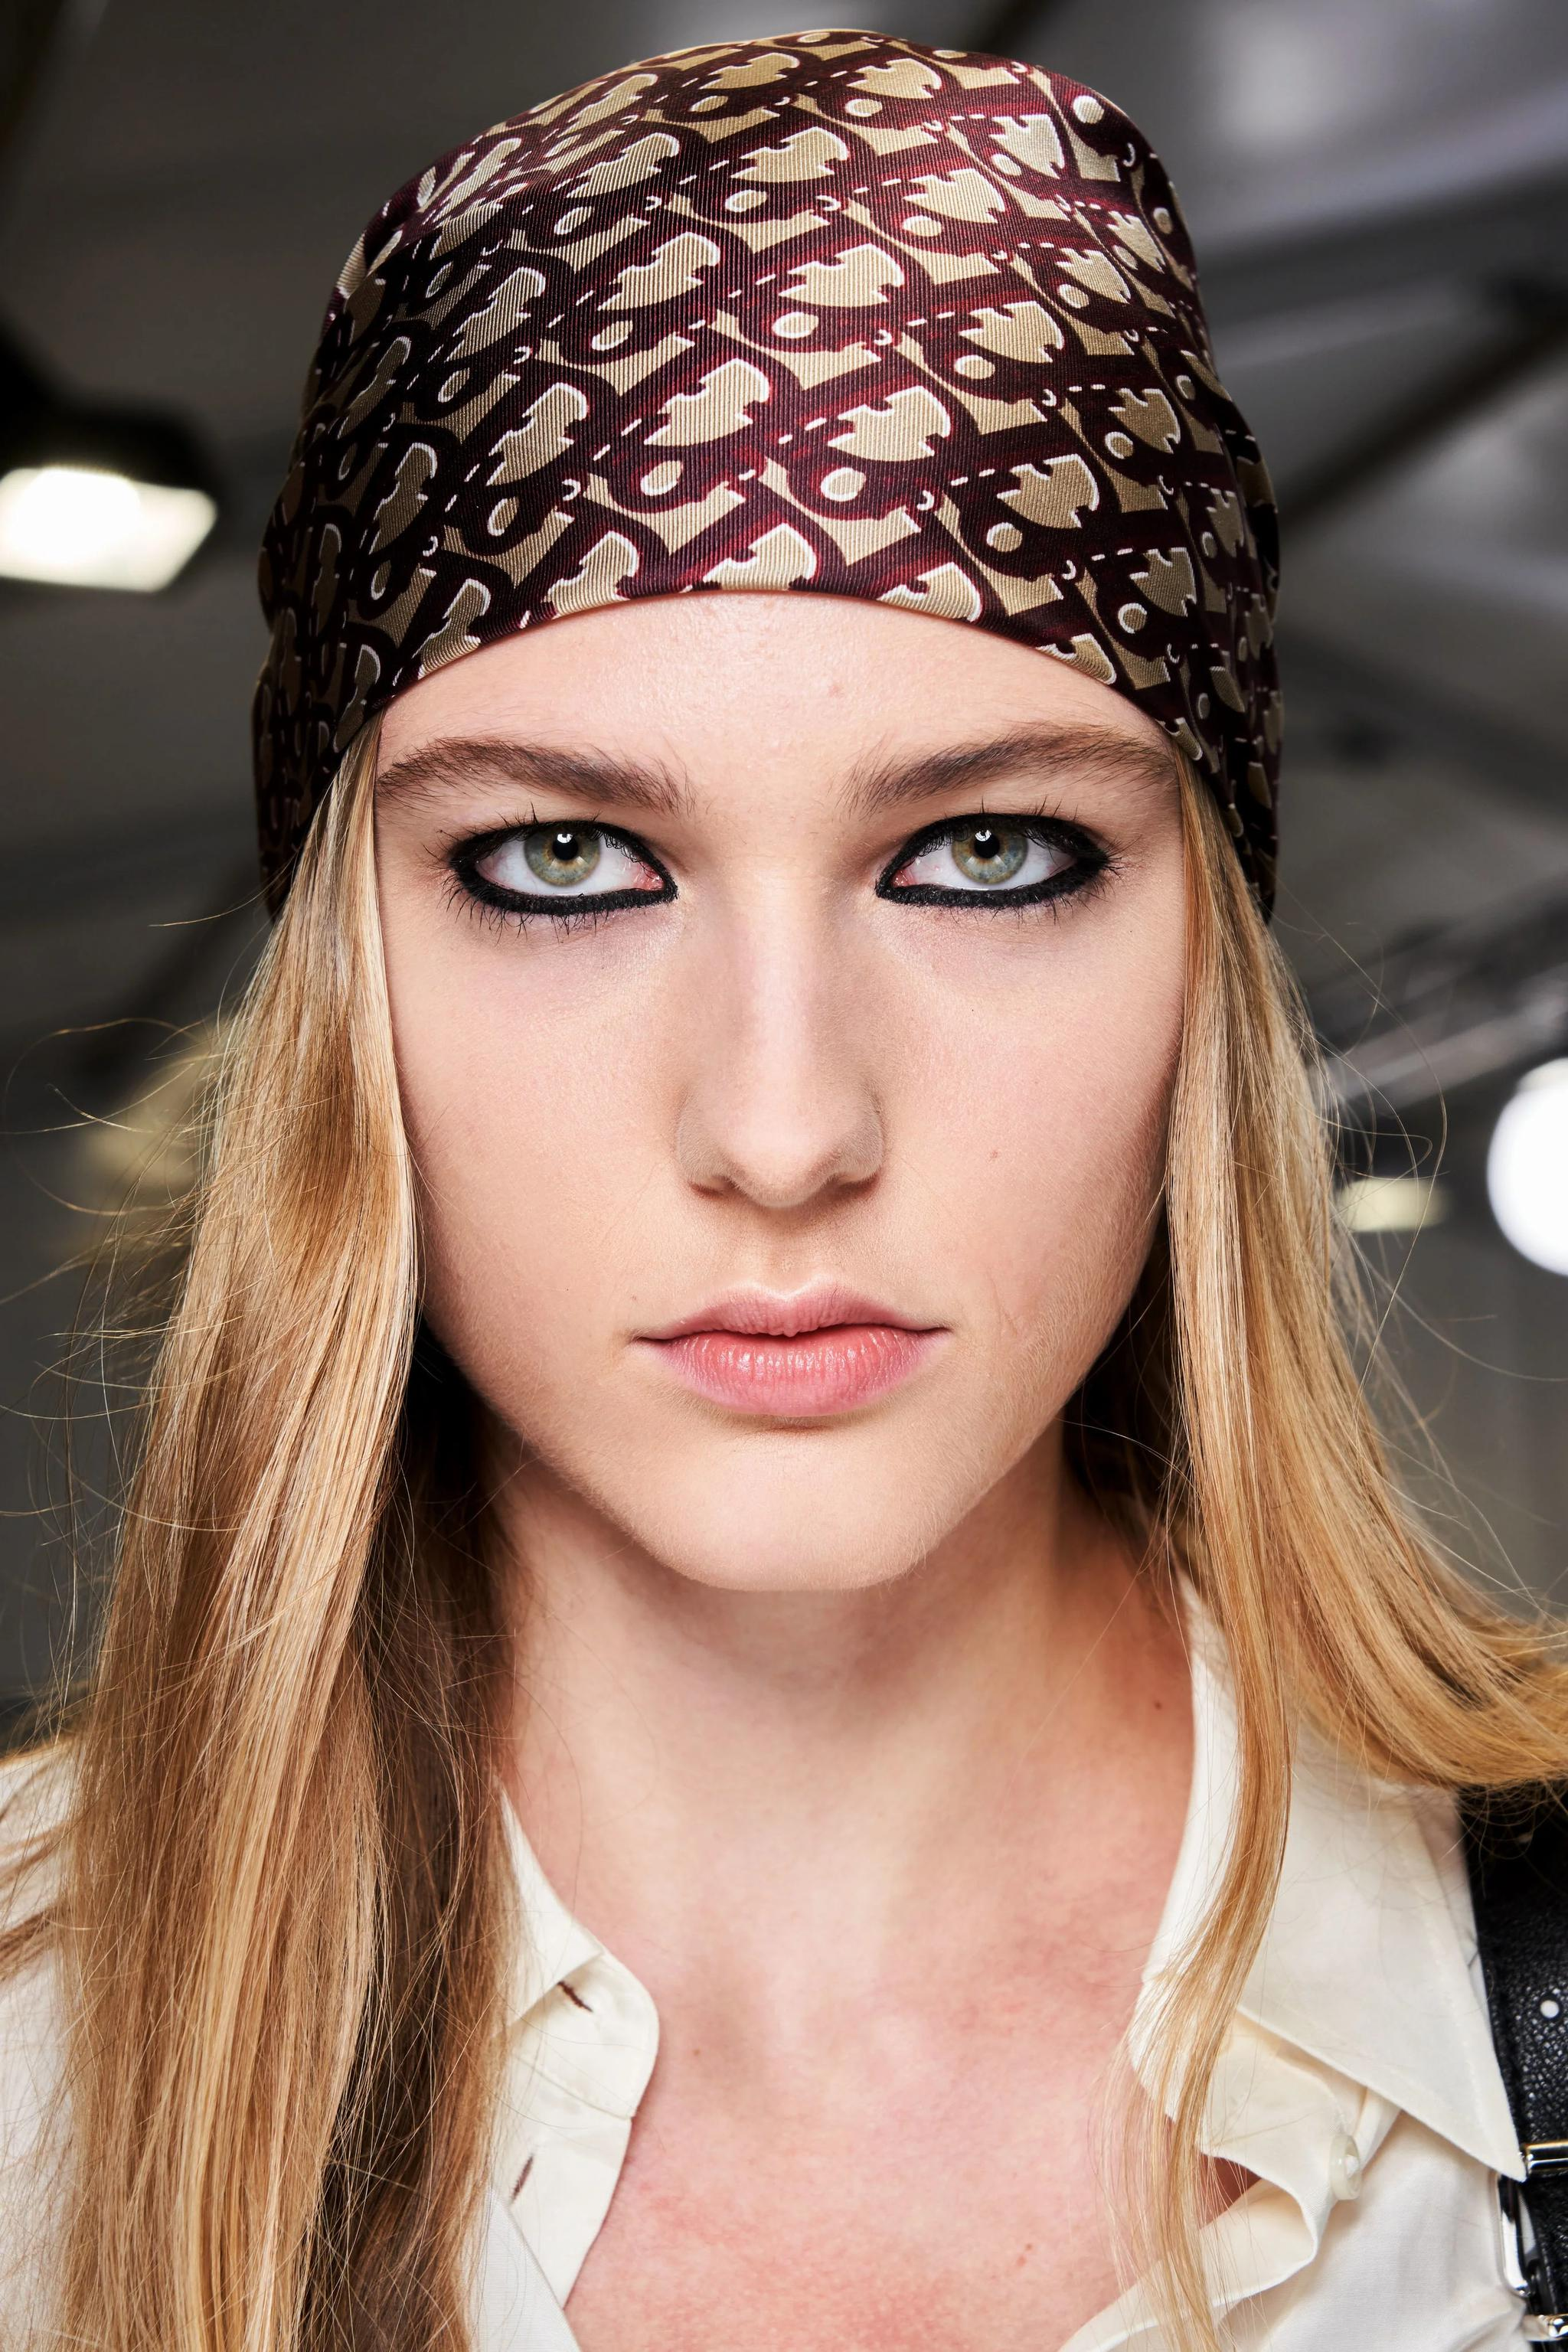 Christian Dior Fall Winter 2020秀场妆容把复古全包眼线带到了T台前